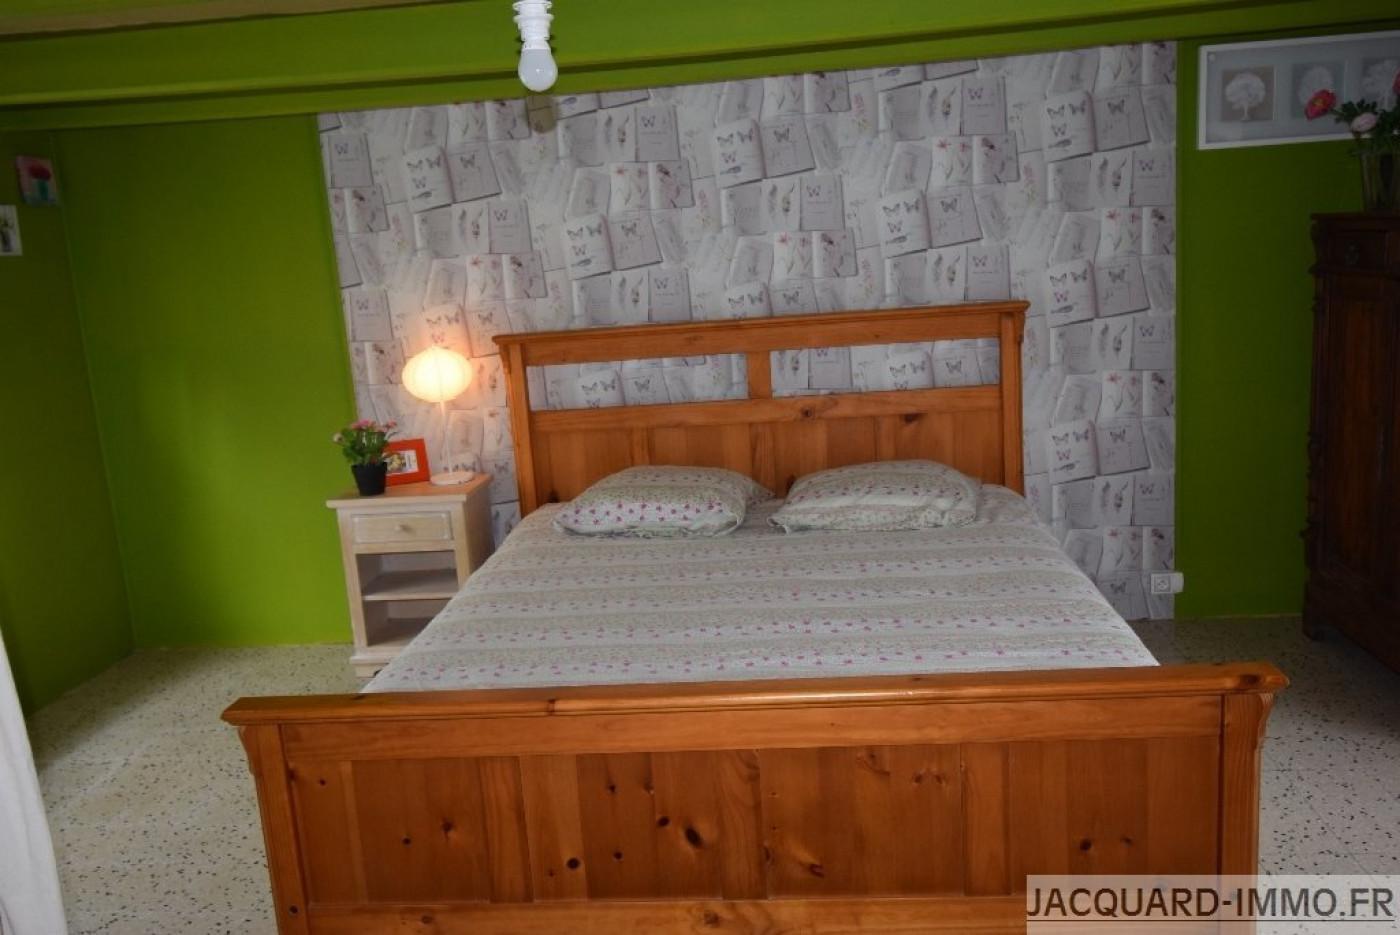 A vendre Guines 6200410226 Jacquard immobilier